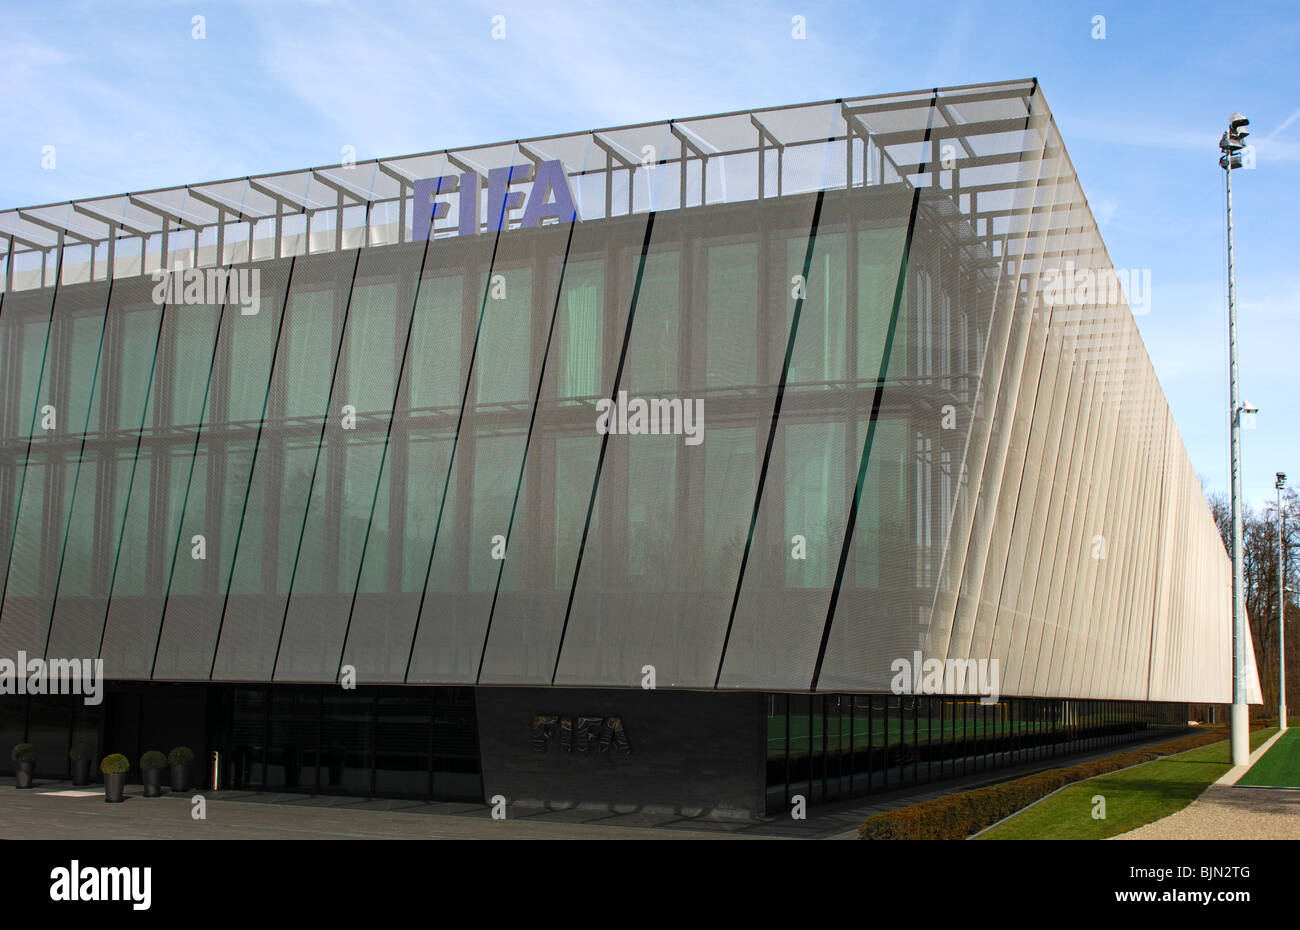 Home of FIFA, headquarters of the Fédération Internationale de Football Association, FIFA, Zurich, Switzerland - Stock Image